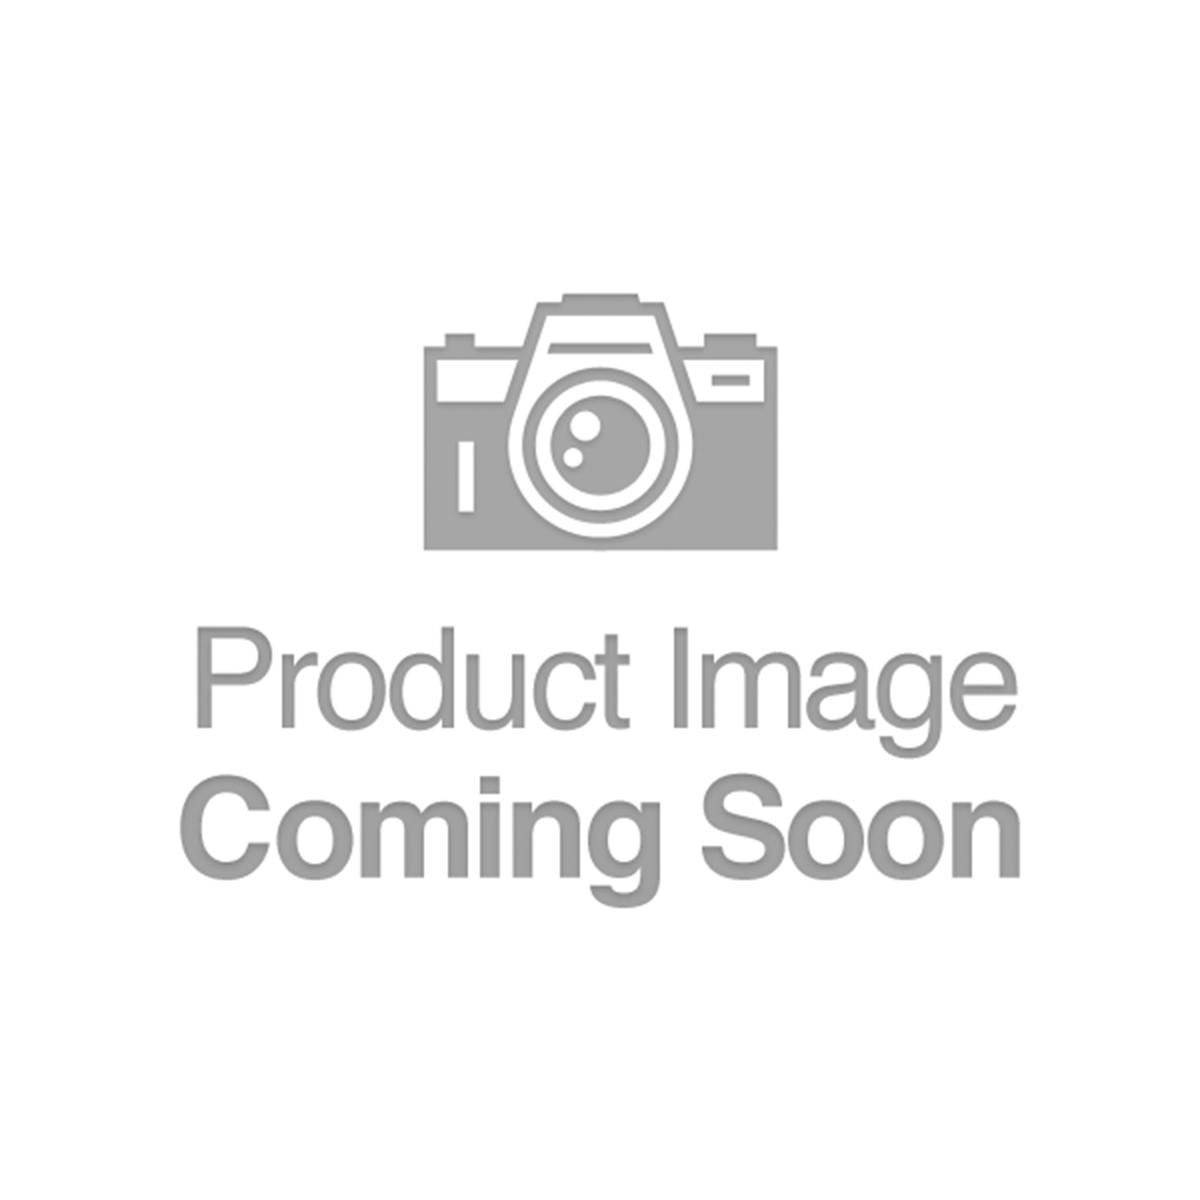 Rare! Mint Keystone Watch Co. Hunting Case Pocket Watch